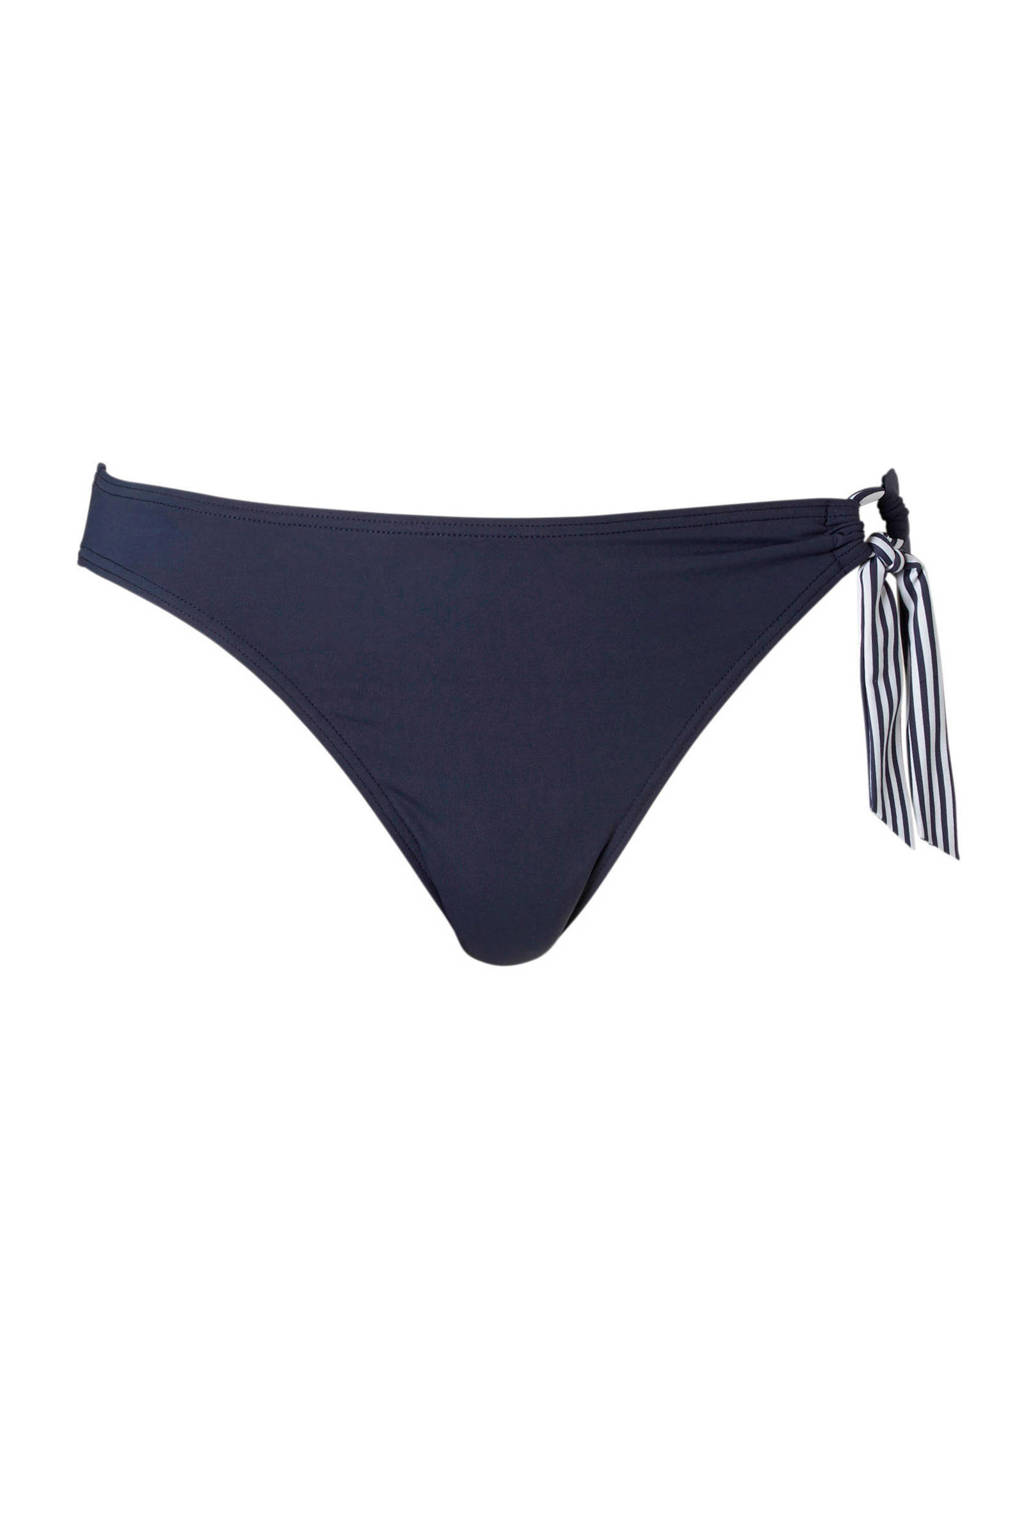 ESPRIT Women Beach Mix & Match bikinibroekje met heup detail blauw, Blauw